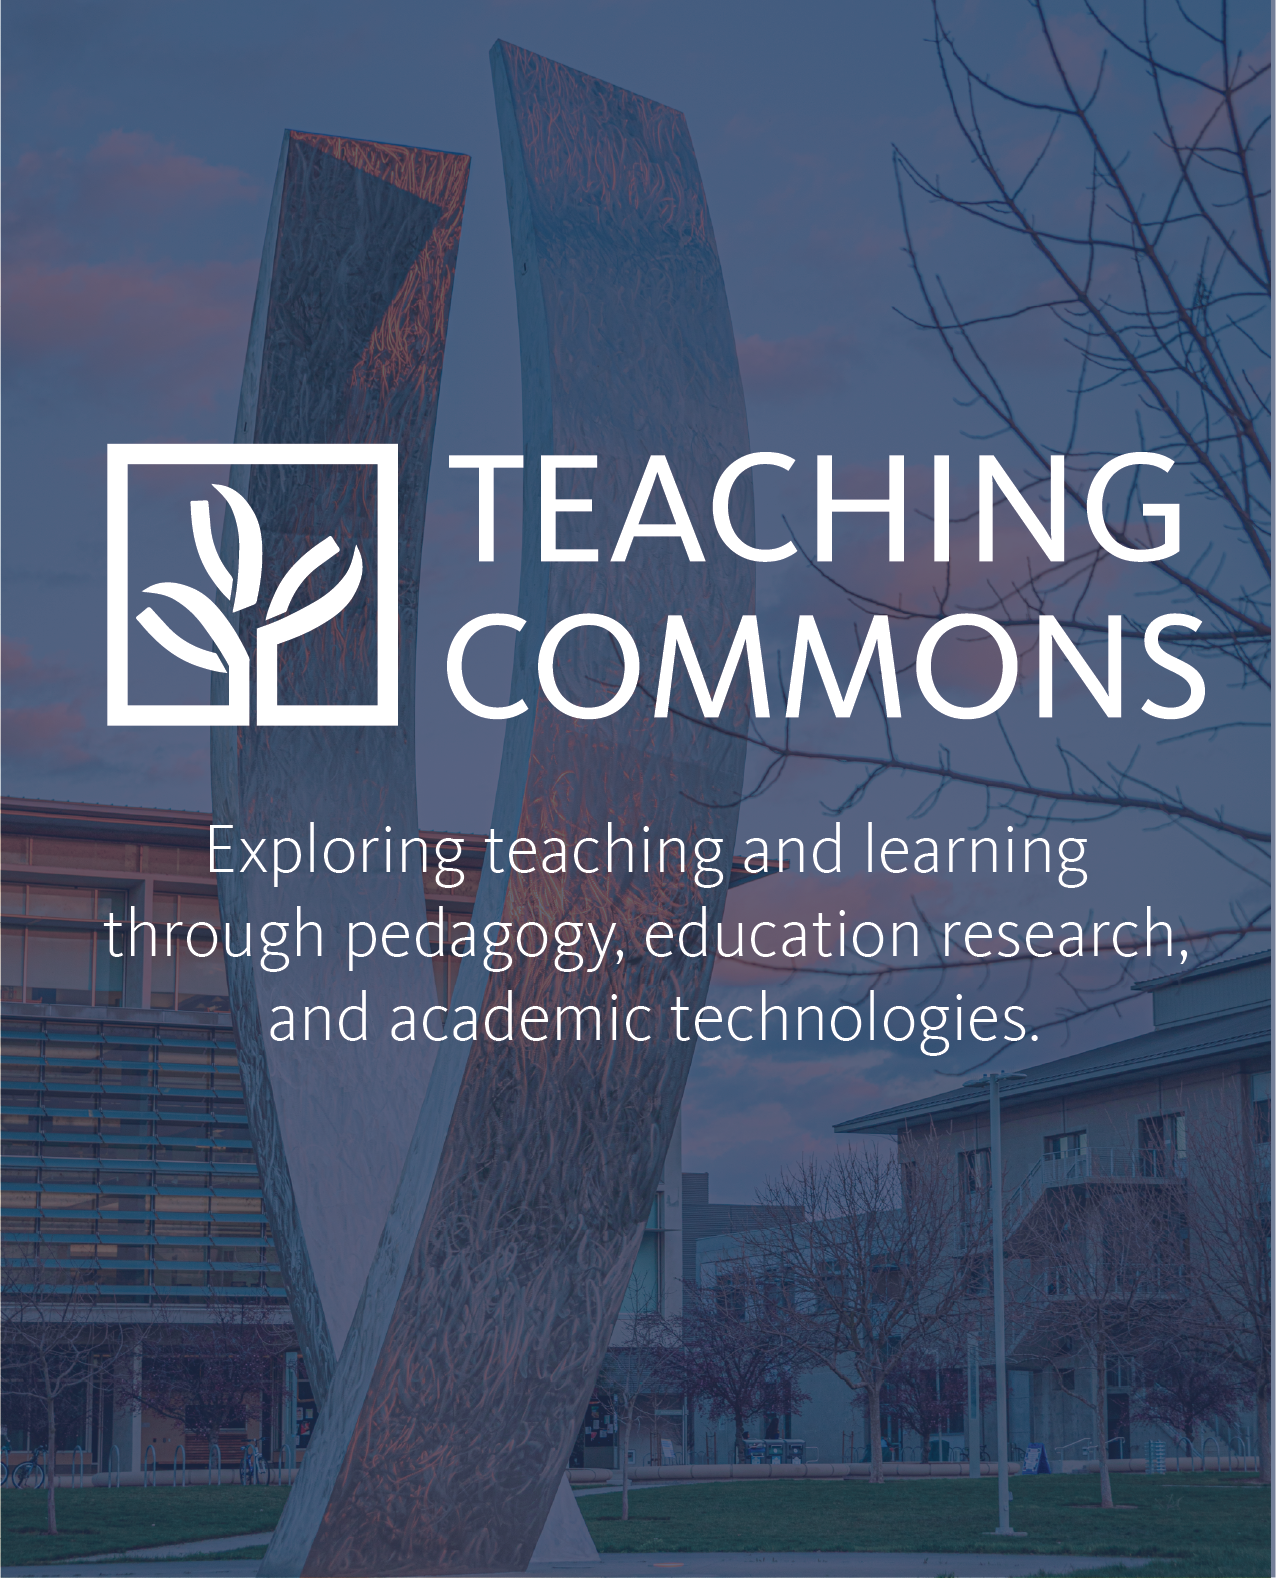 teaching commons header image